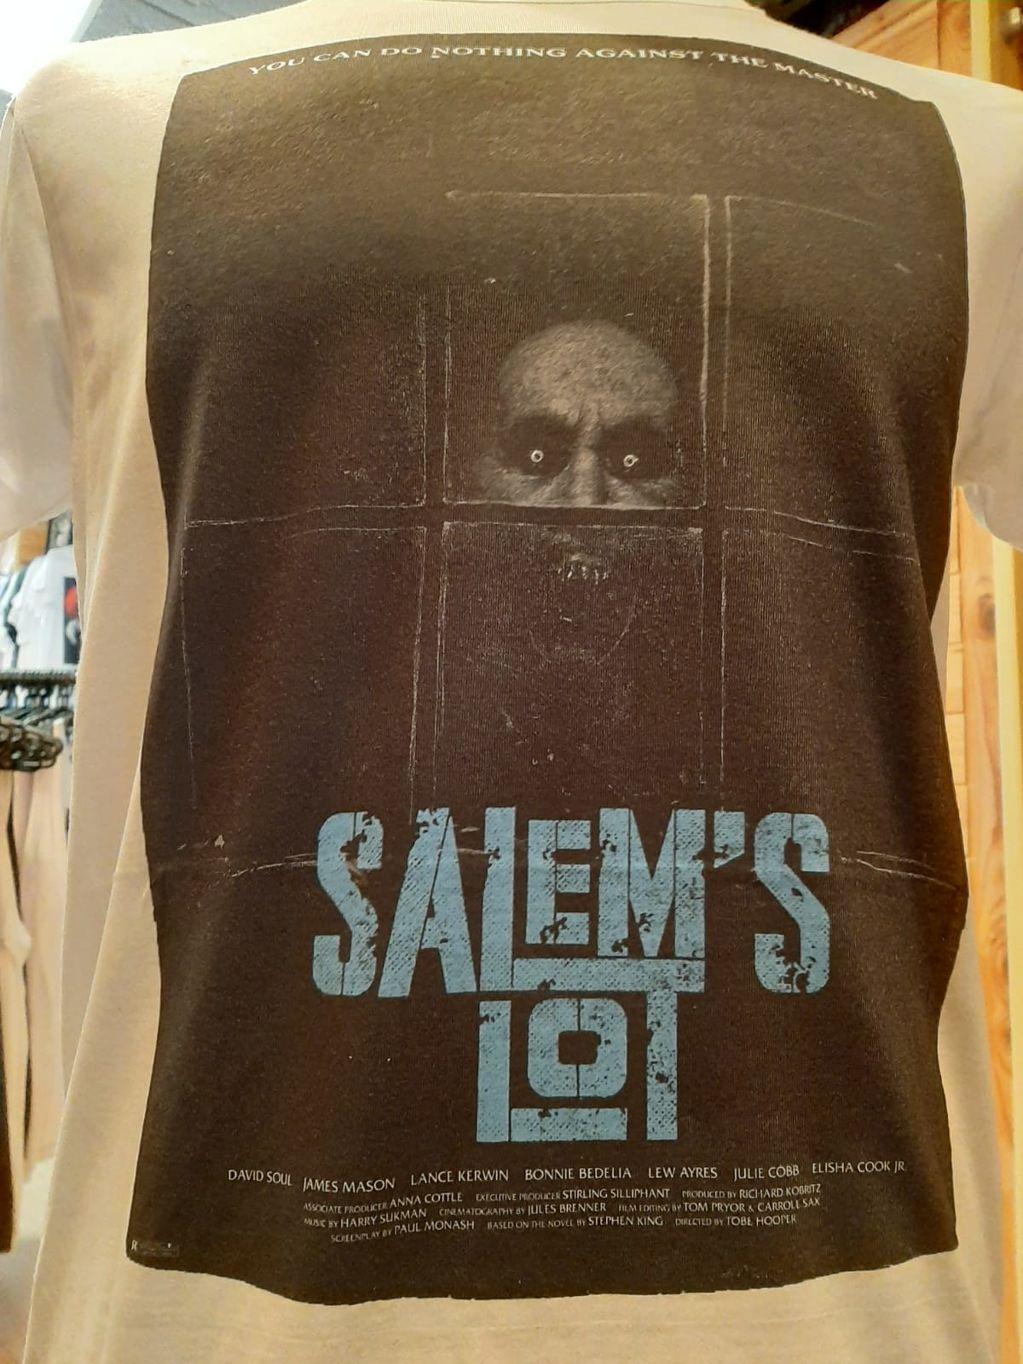 Salem's Lot - 4d707-camiseta-salems-lot-3.jpeg